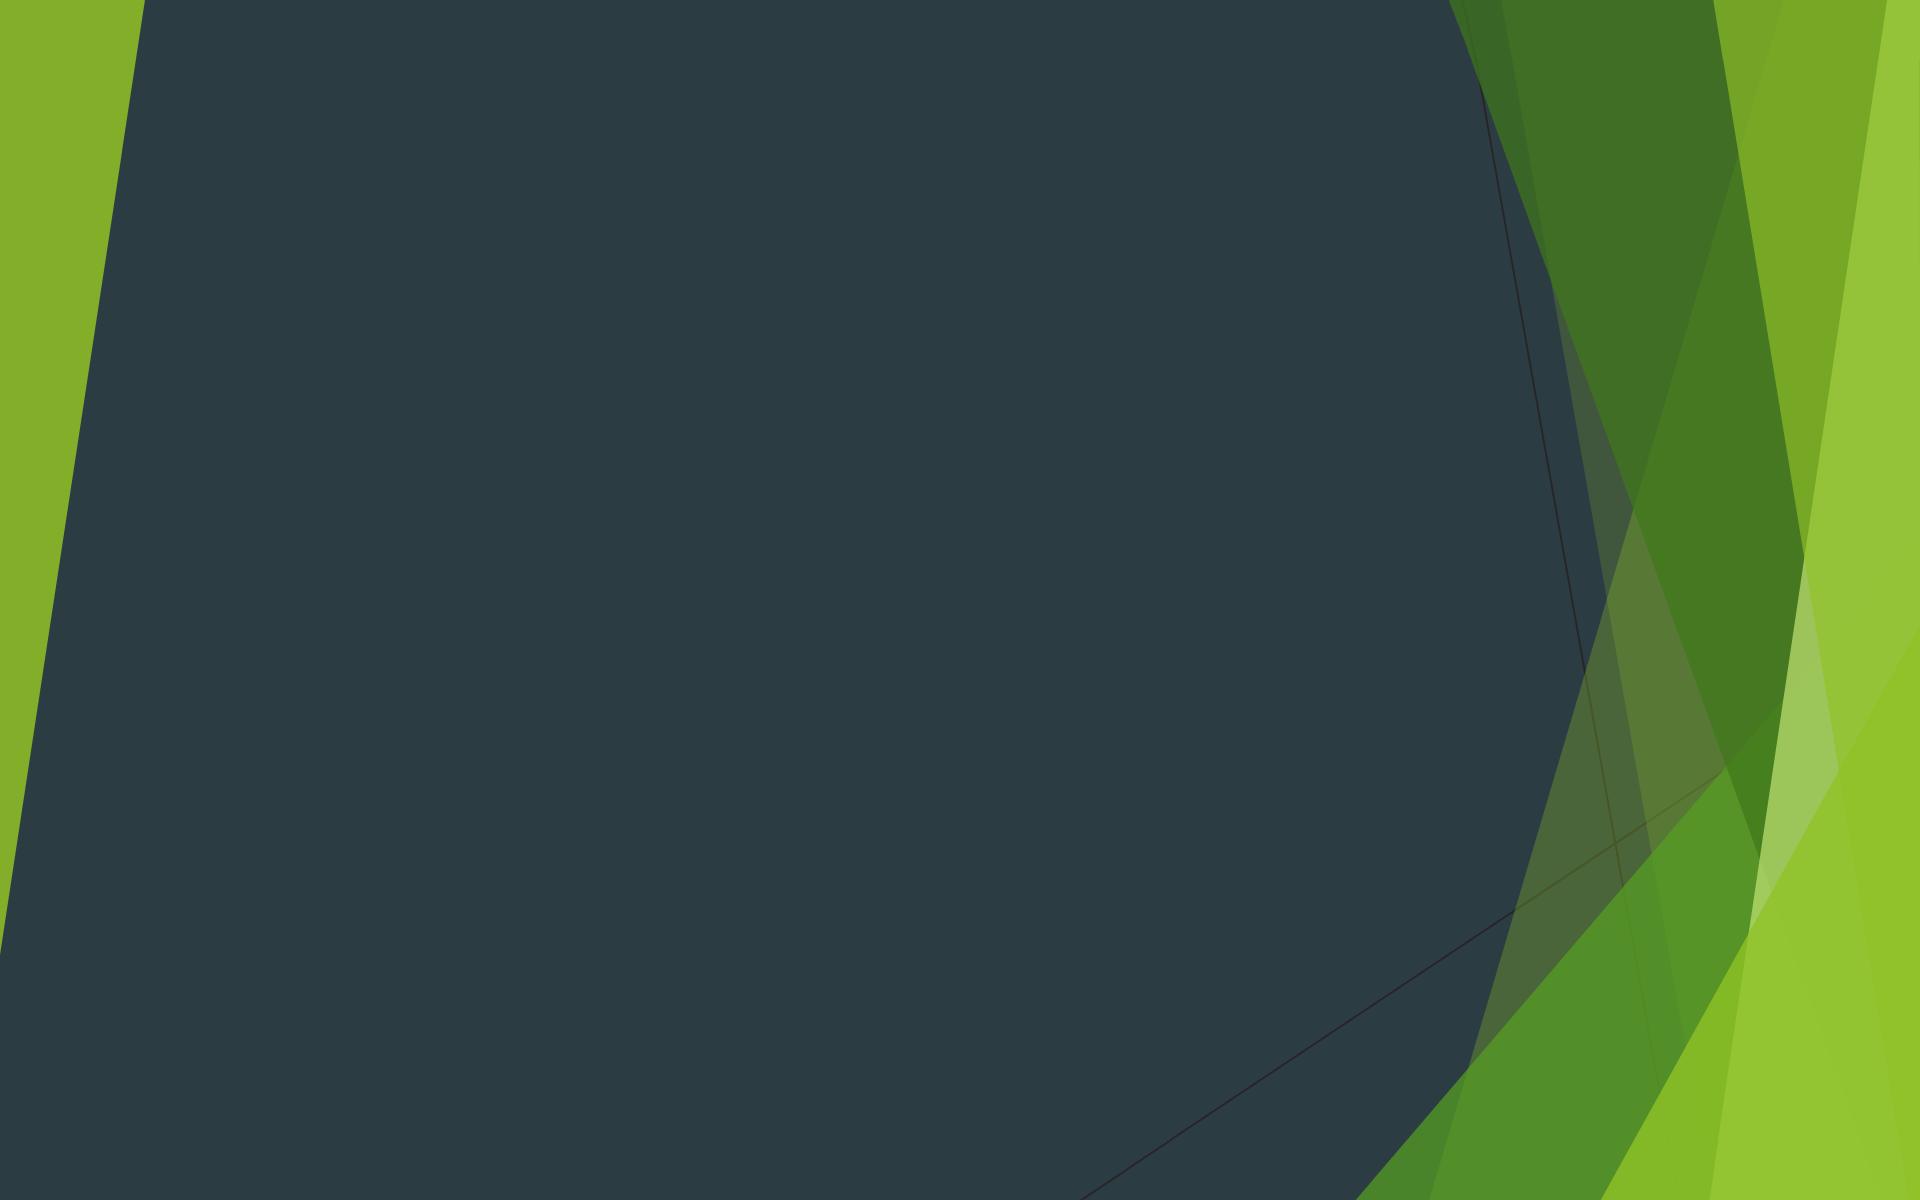 Green Metro Swirl by Snowince